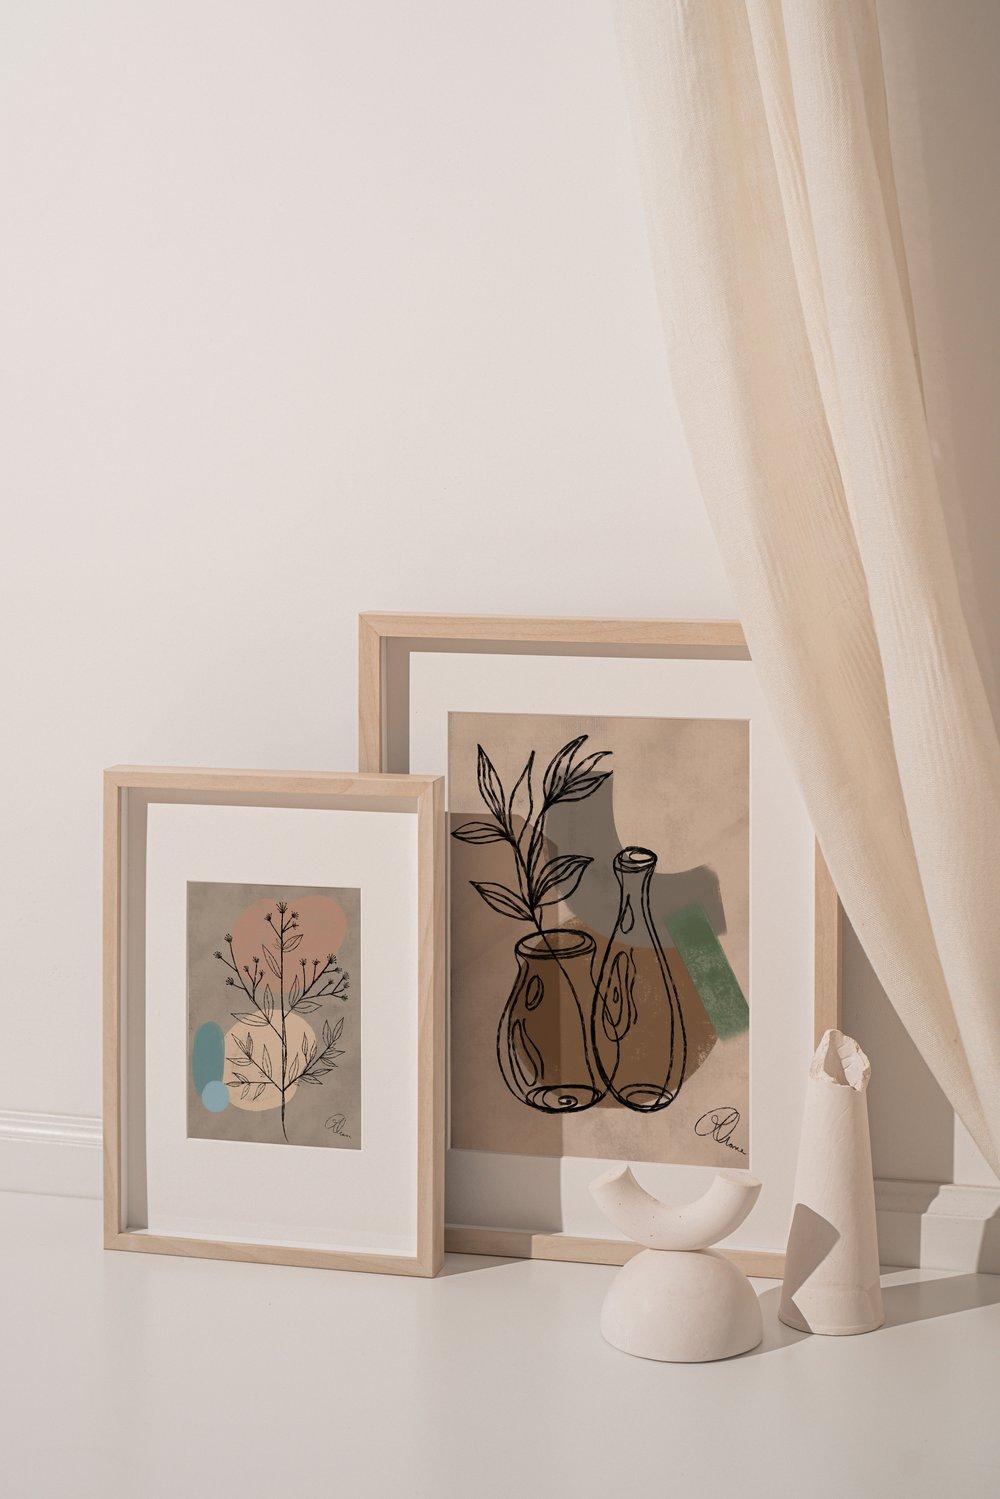 Image of Minimalist Floral Canvas Paintings